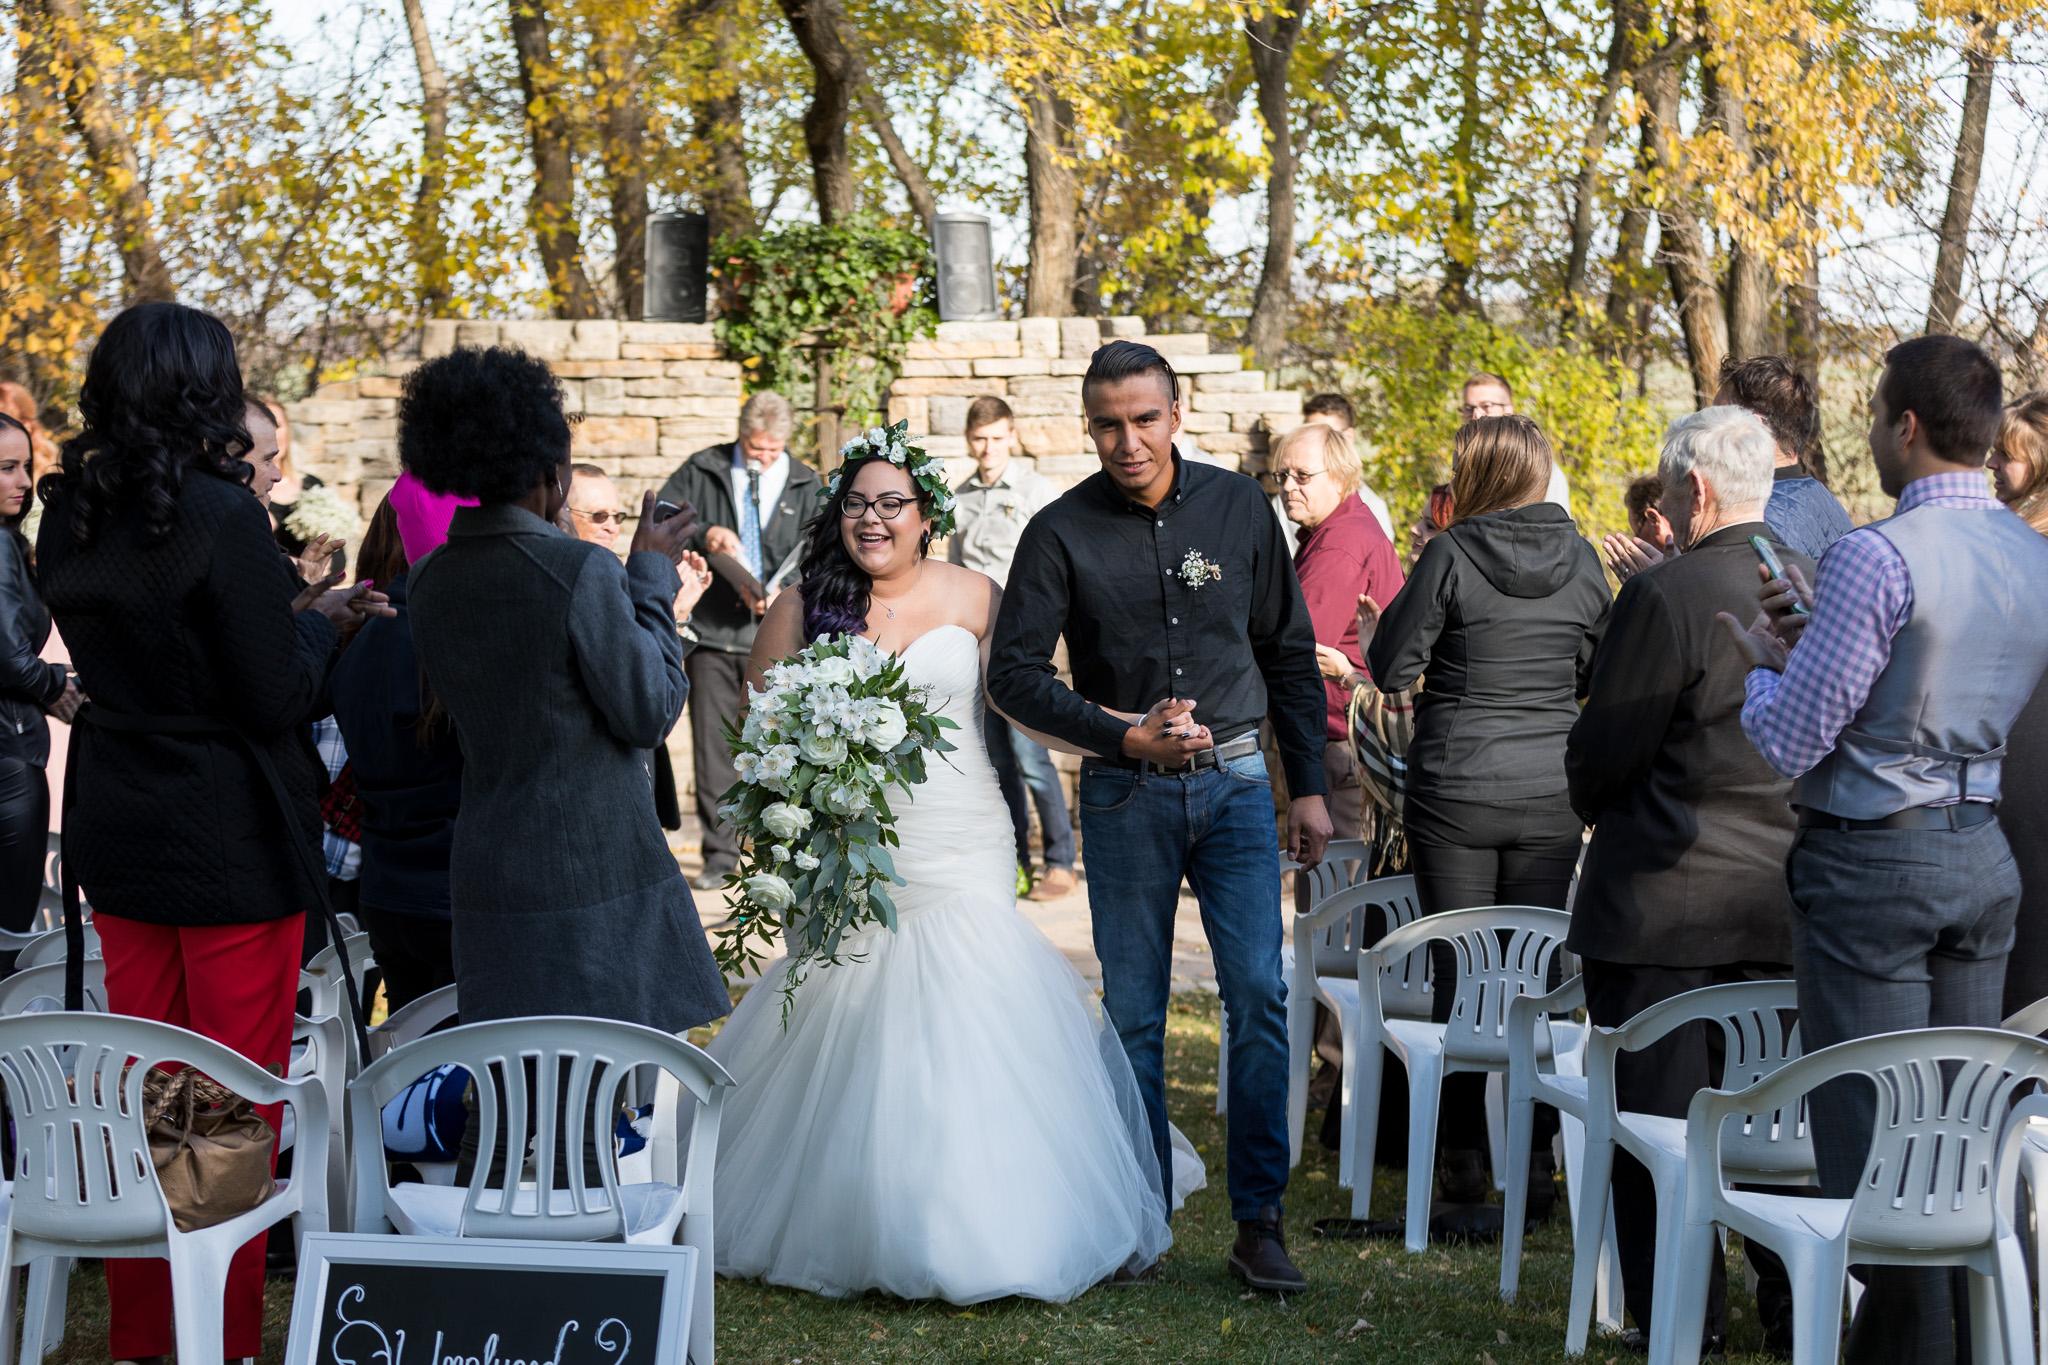 evergreen-village-winnipeg-wedding-28.jpg